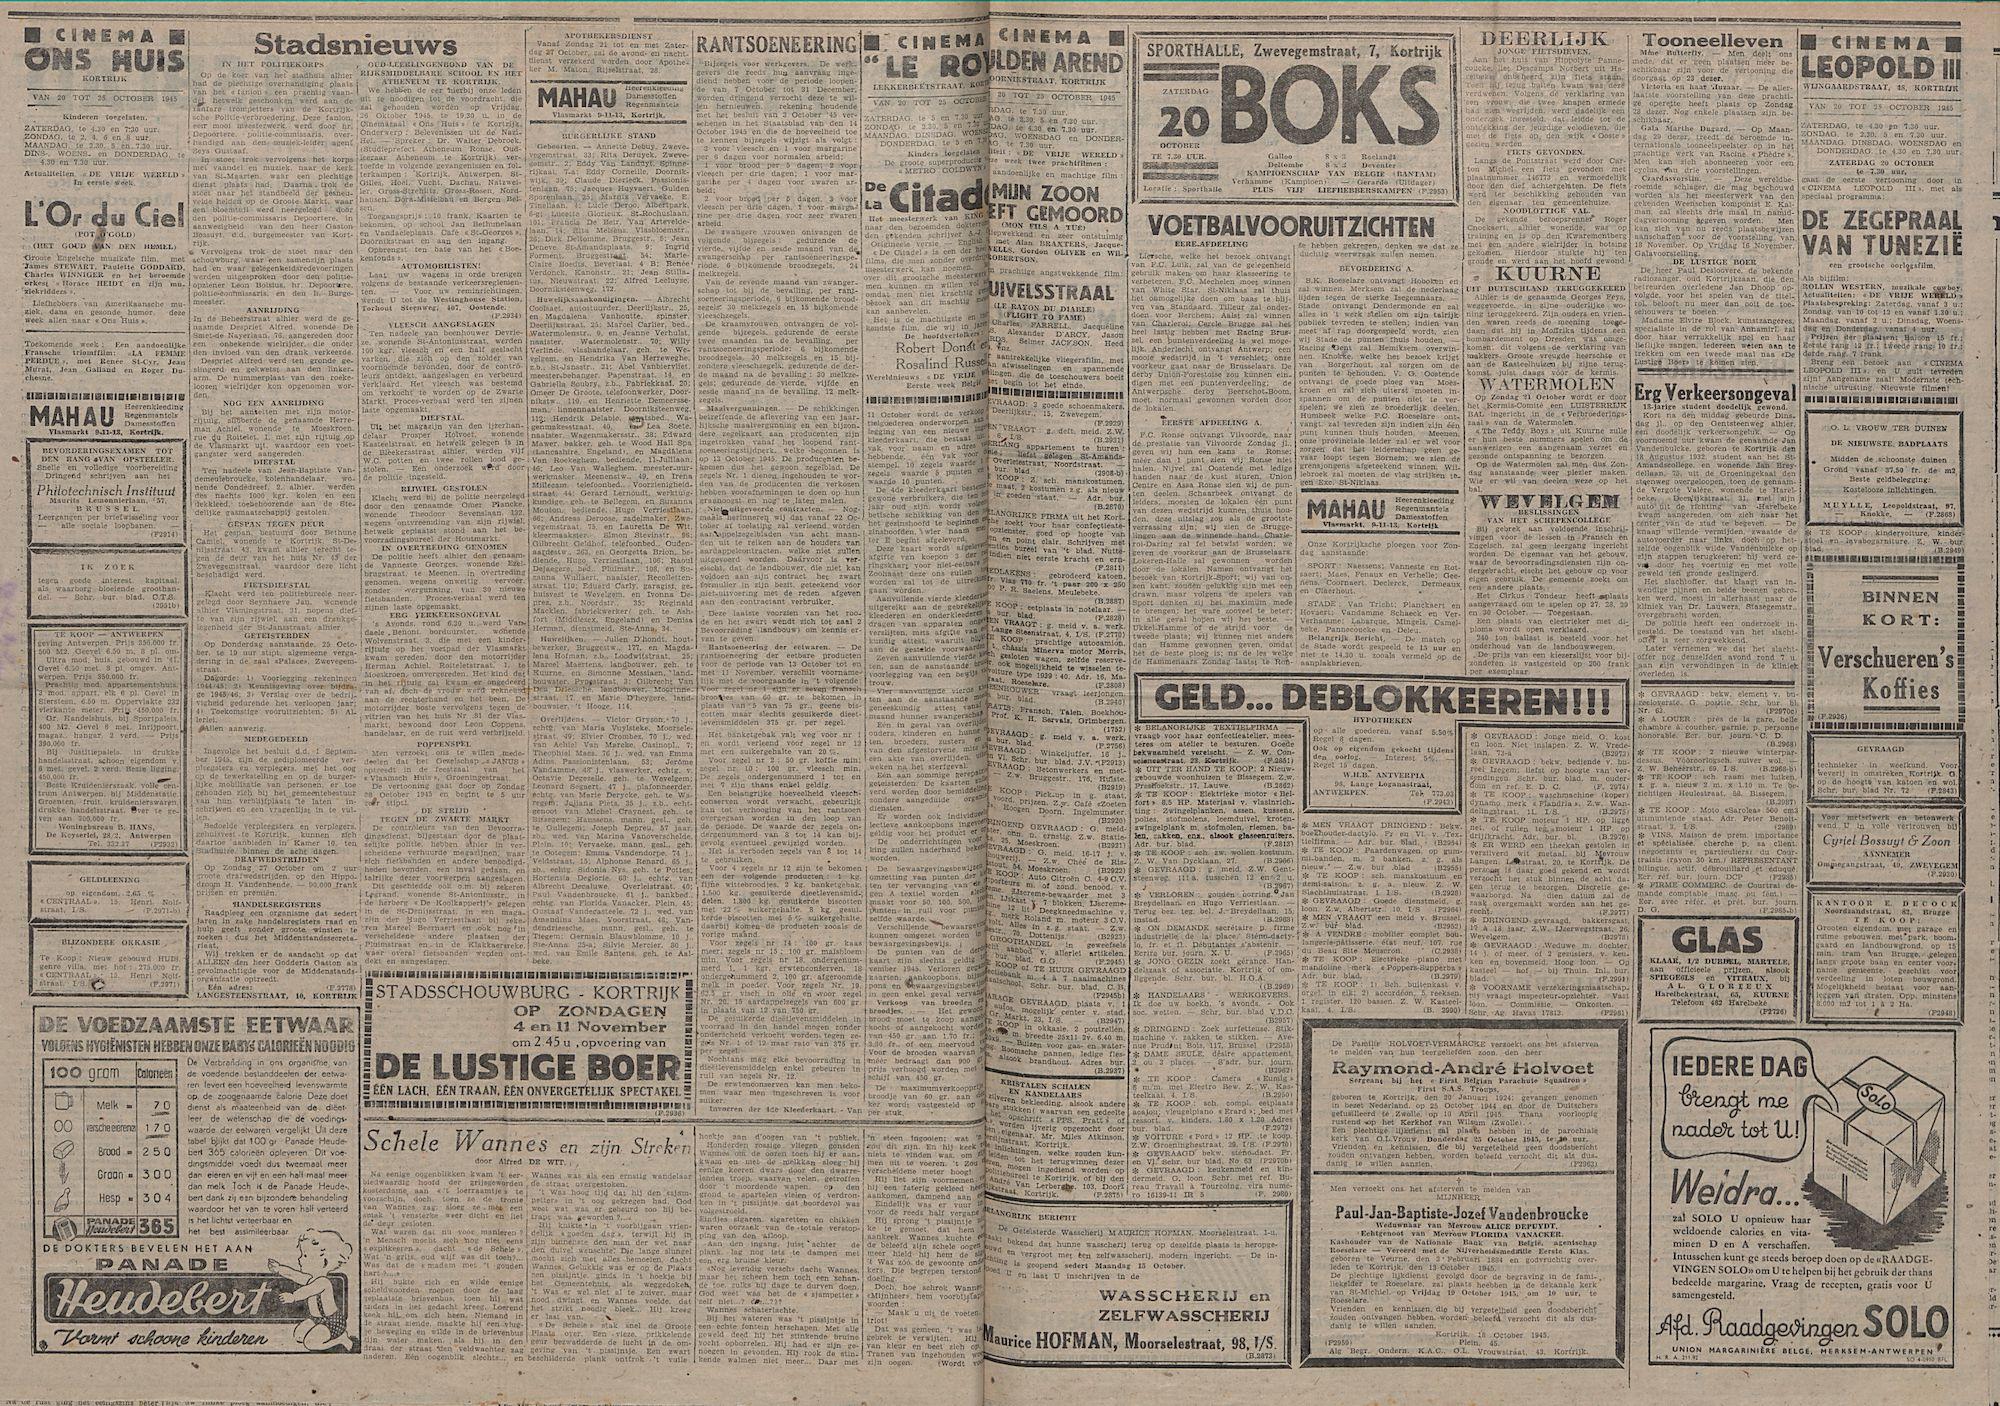 Kortrijksch Handelsblad 19 october 1945 Nr84 p2 en 3